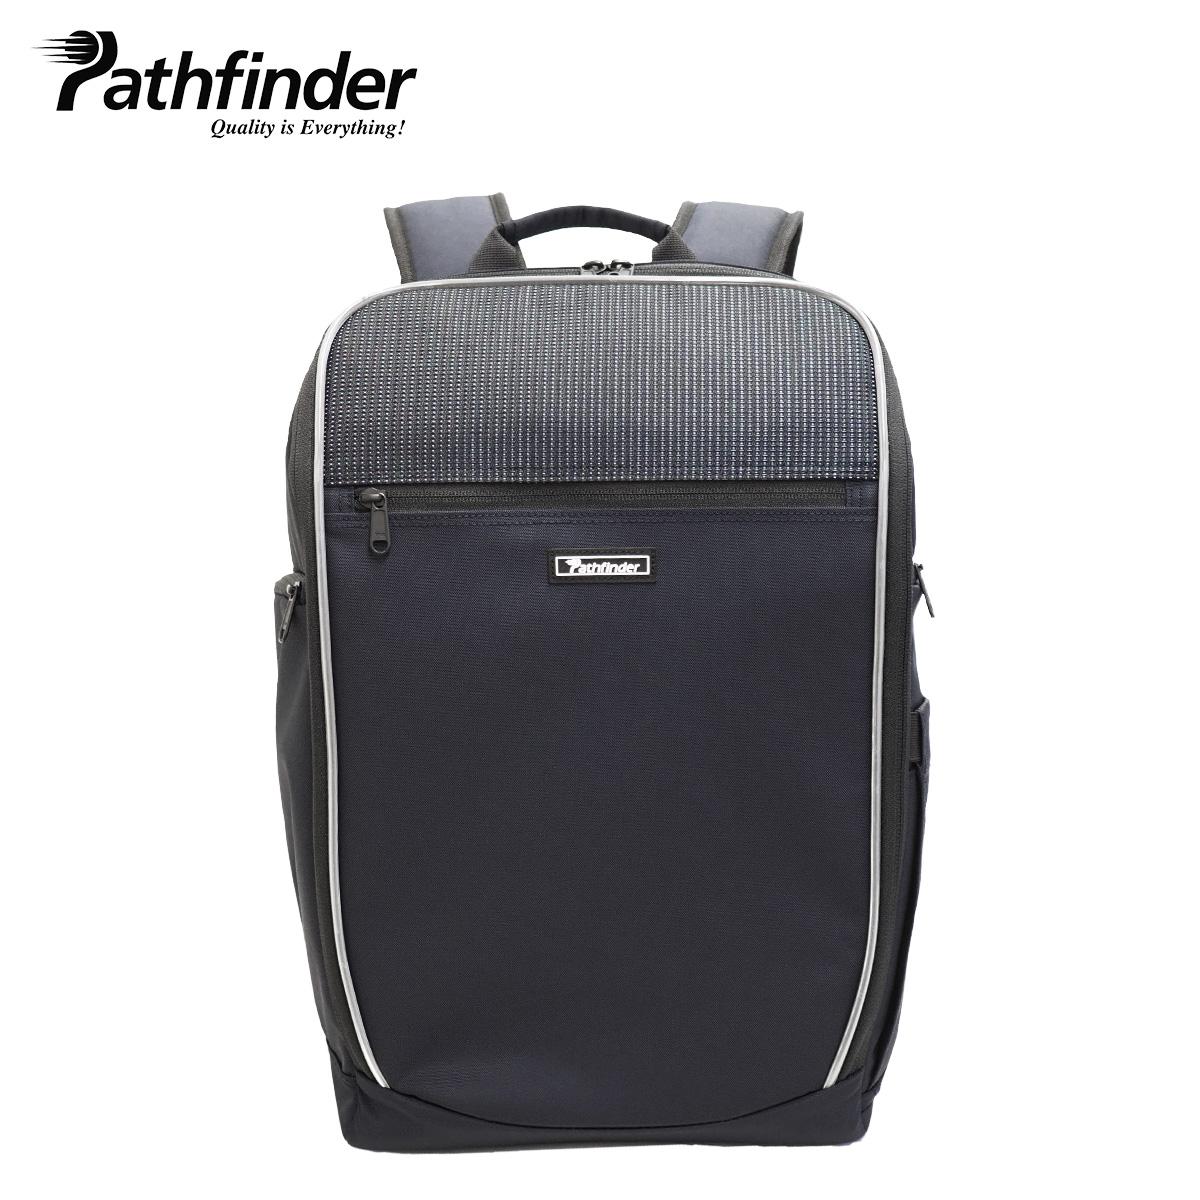 Pathfinder パスファインダー アベンジャー2 コンフォートバックパック リュック バッグ バックパック メンズ AVENGER 2 COMFORT BACKPACK ブラック 黒 PF1903B